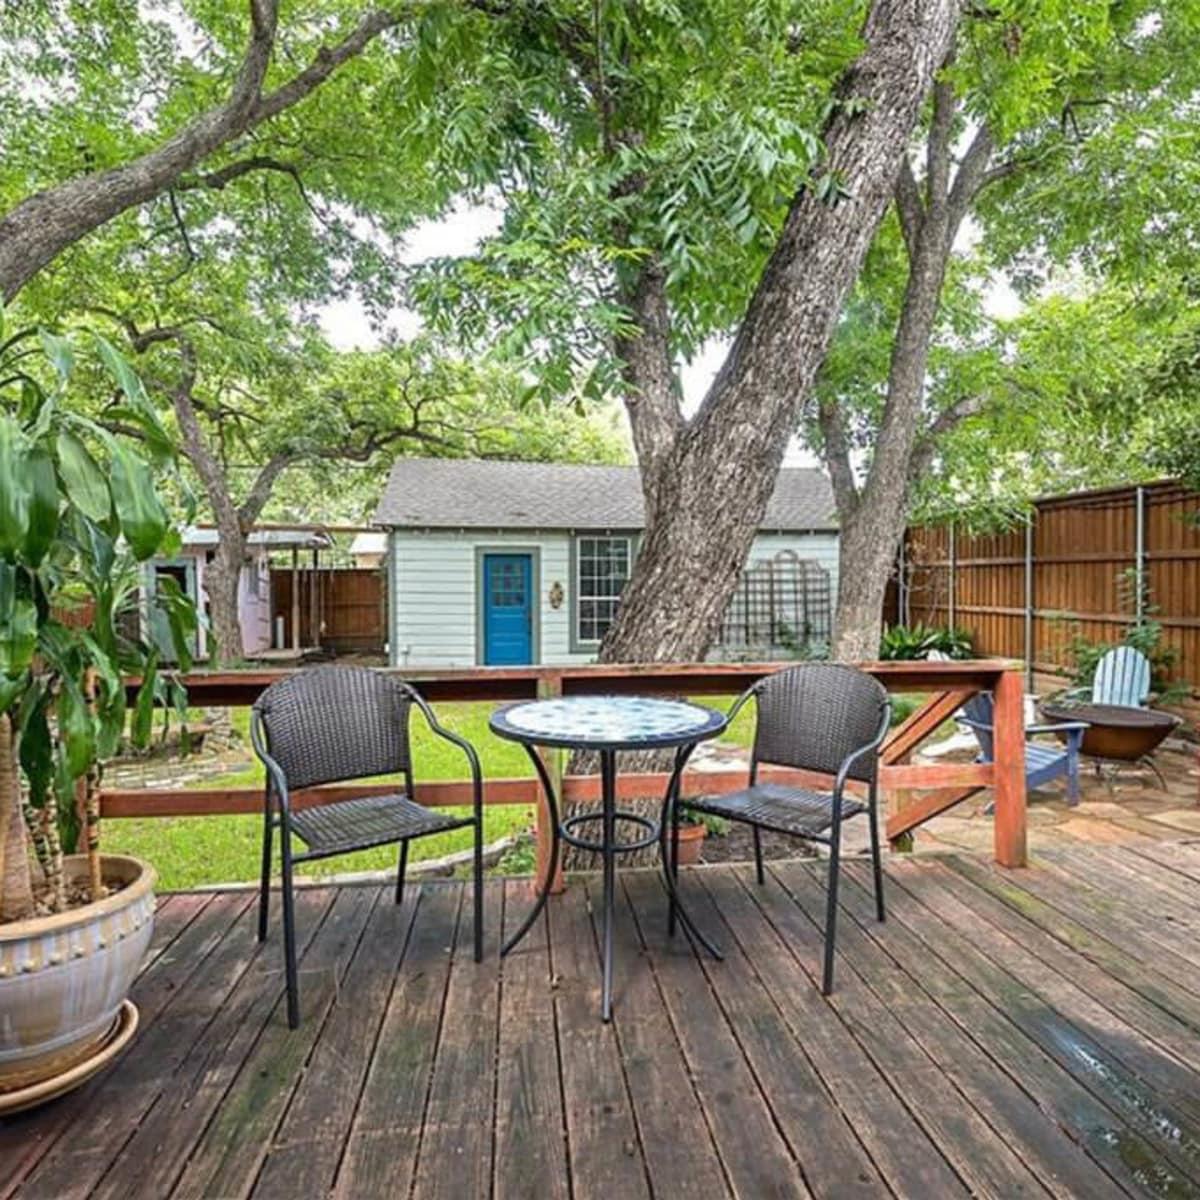 Backyard at 701 S. Clinton Ave. in Oak Cliff